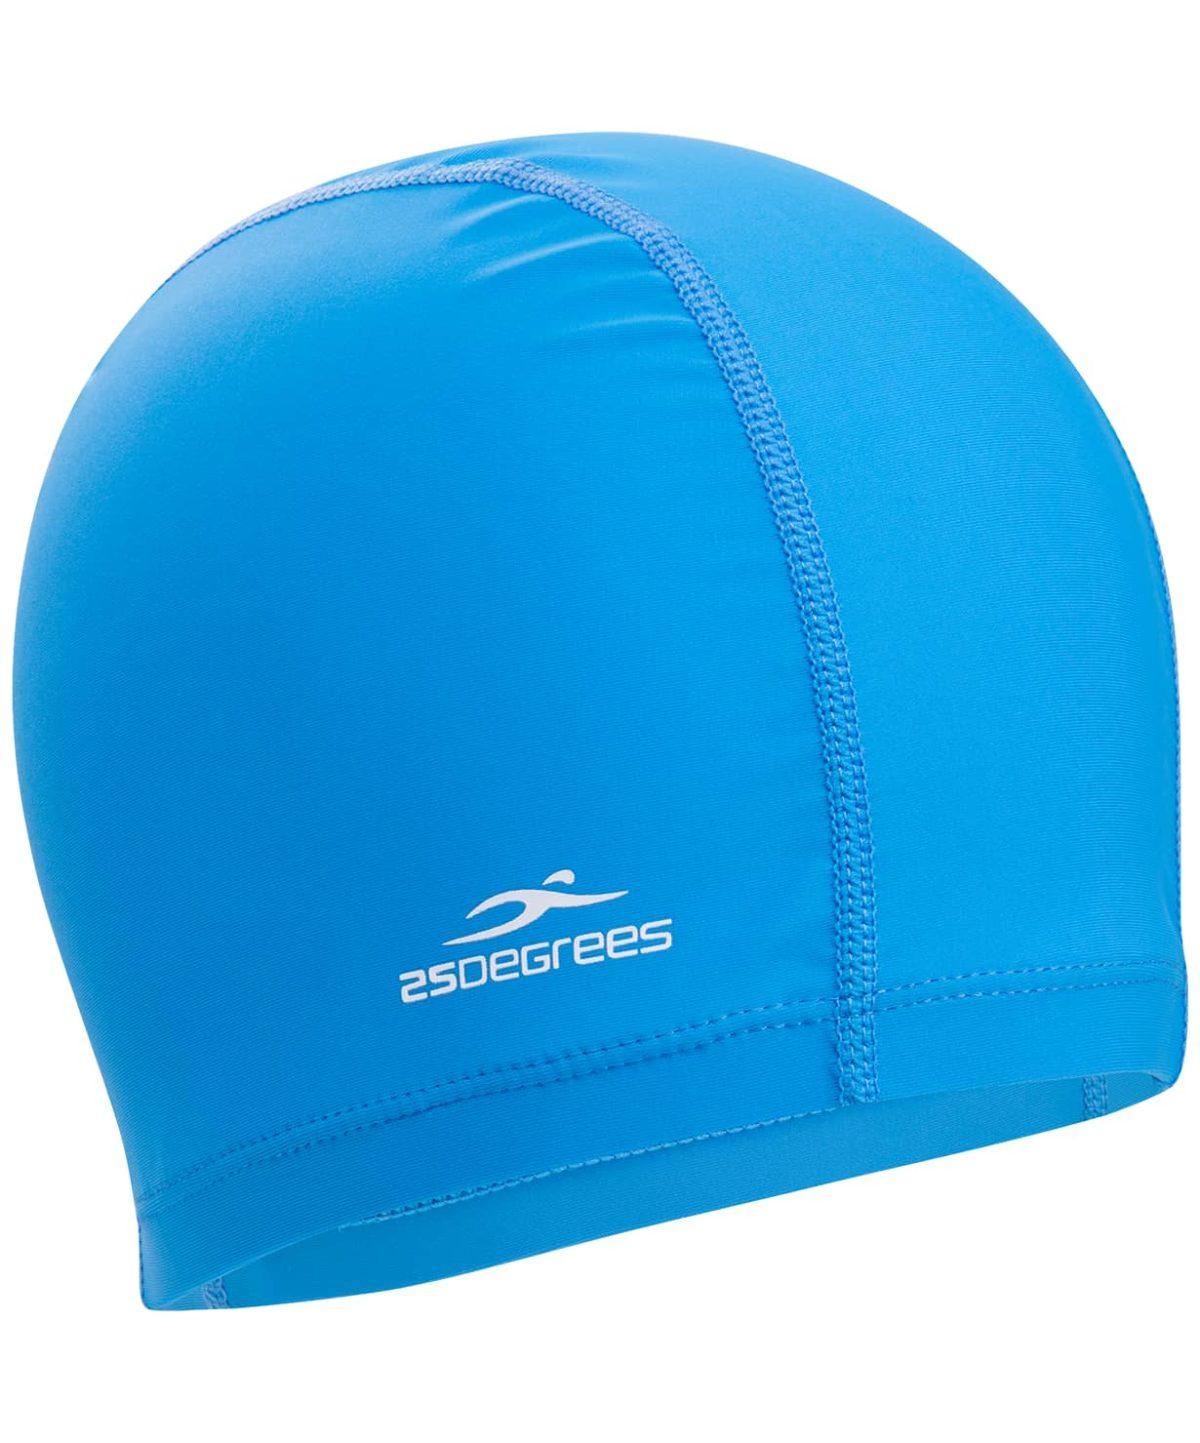 25DEGREES Шапочка для плавания Comfo, полиэстер  25D21001A: голубой - 2